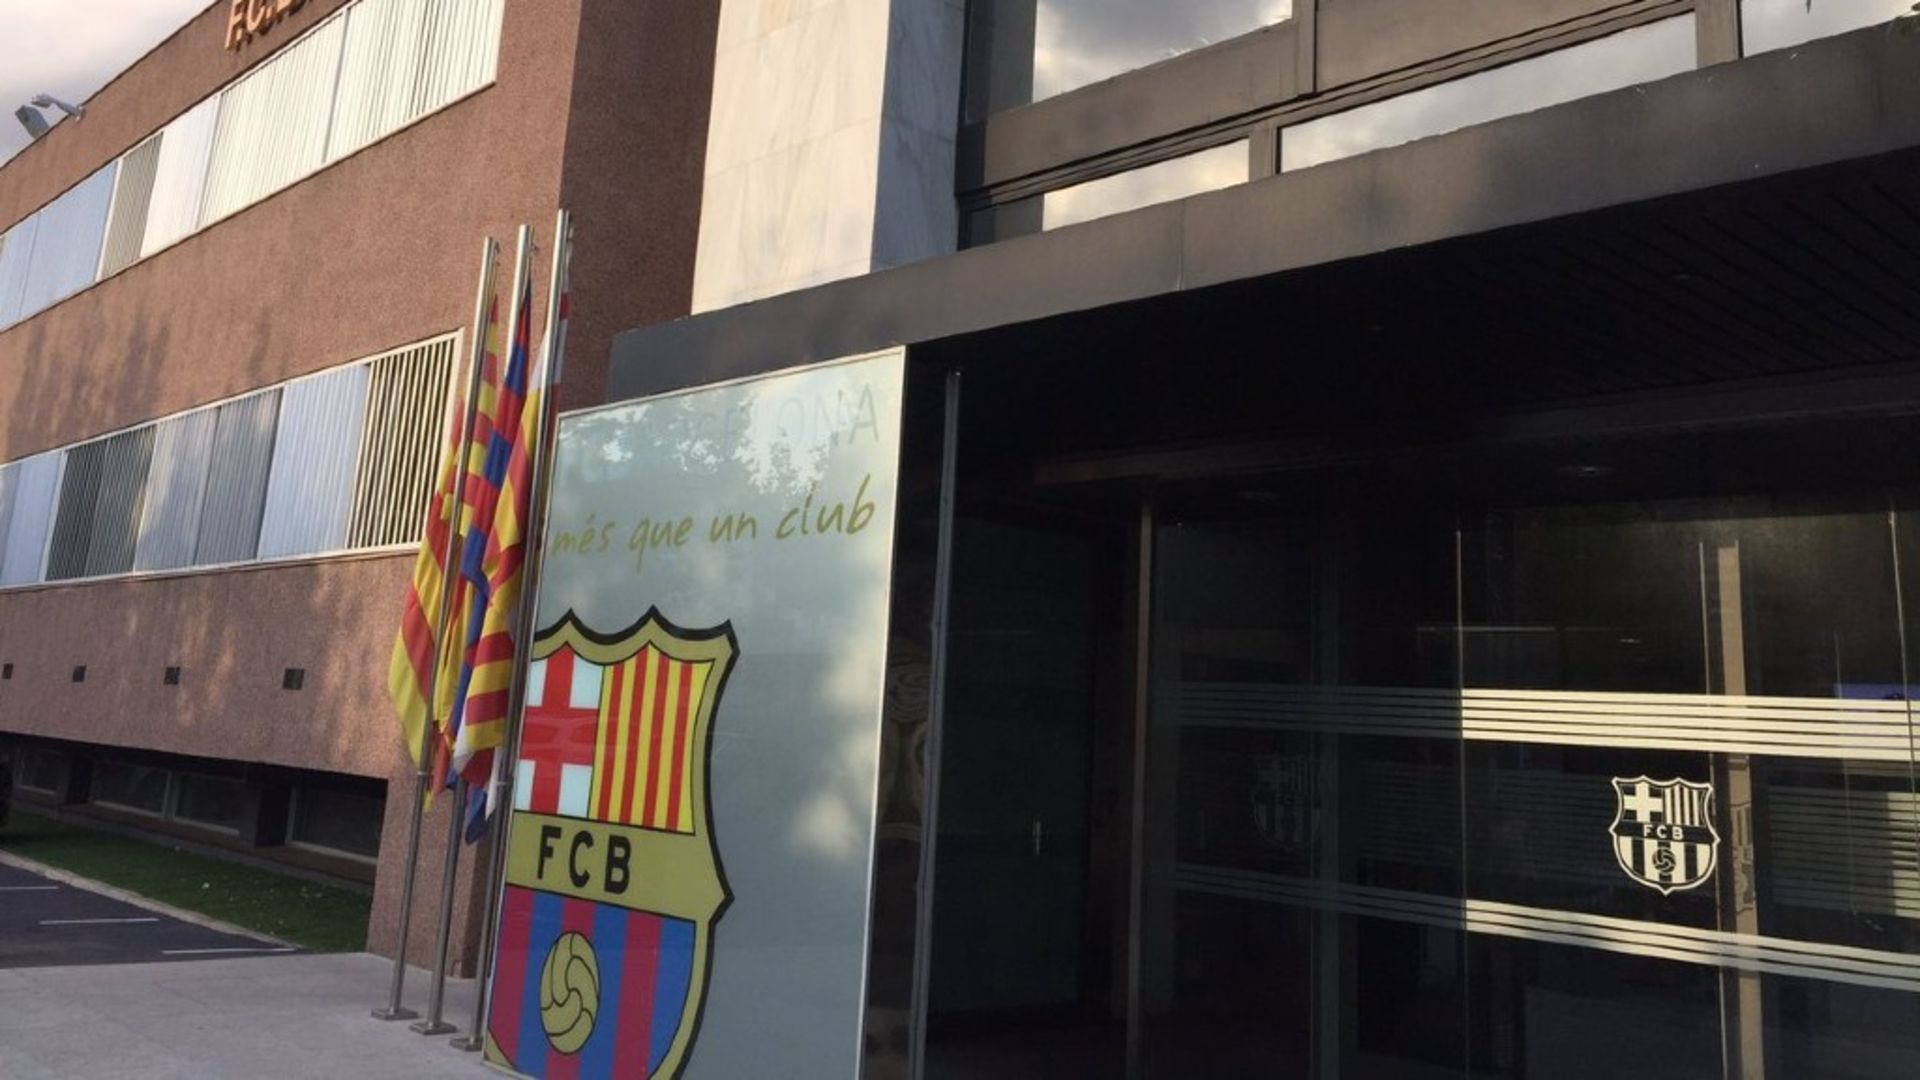 Oficines FC Barcelona